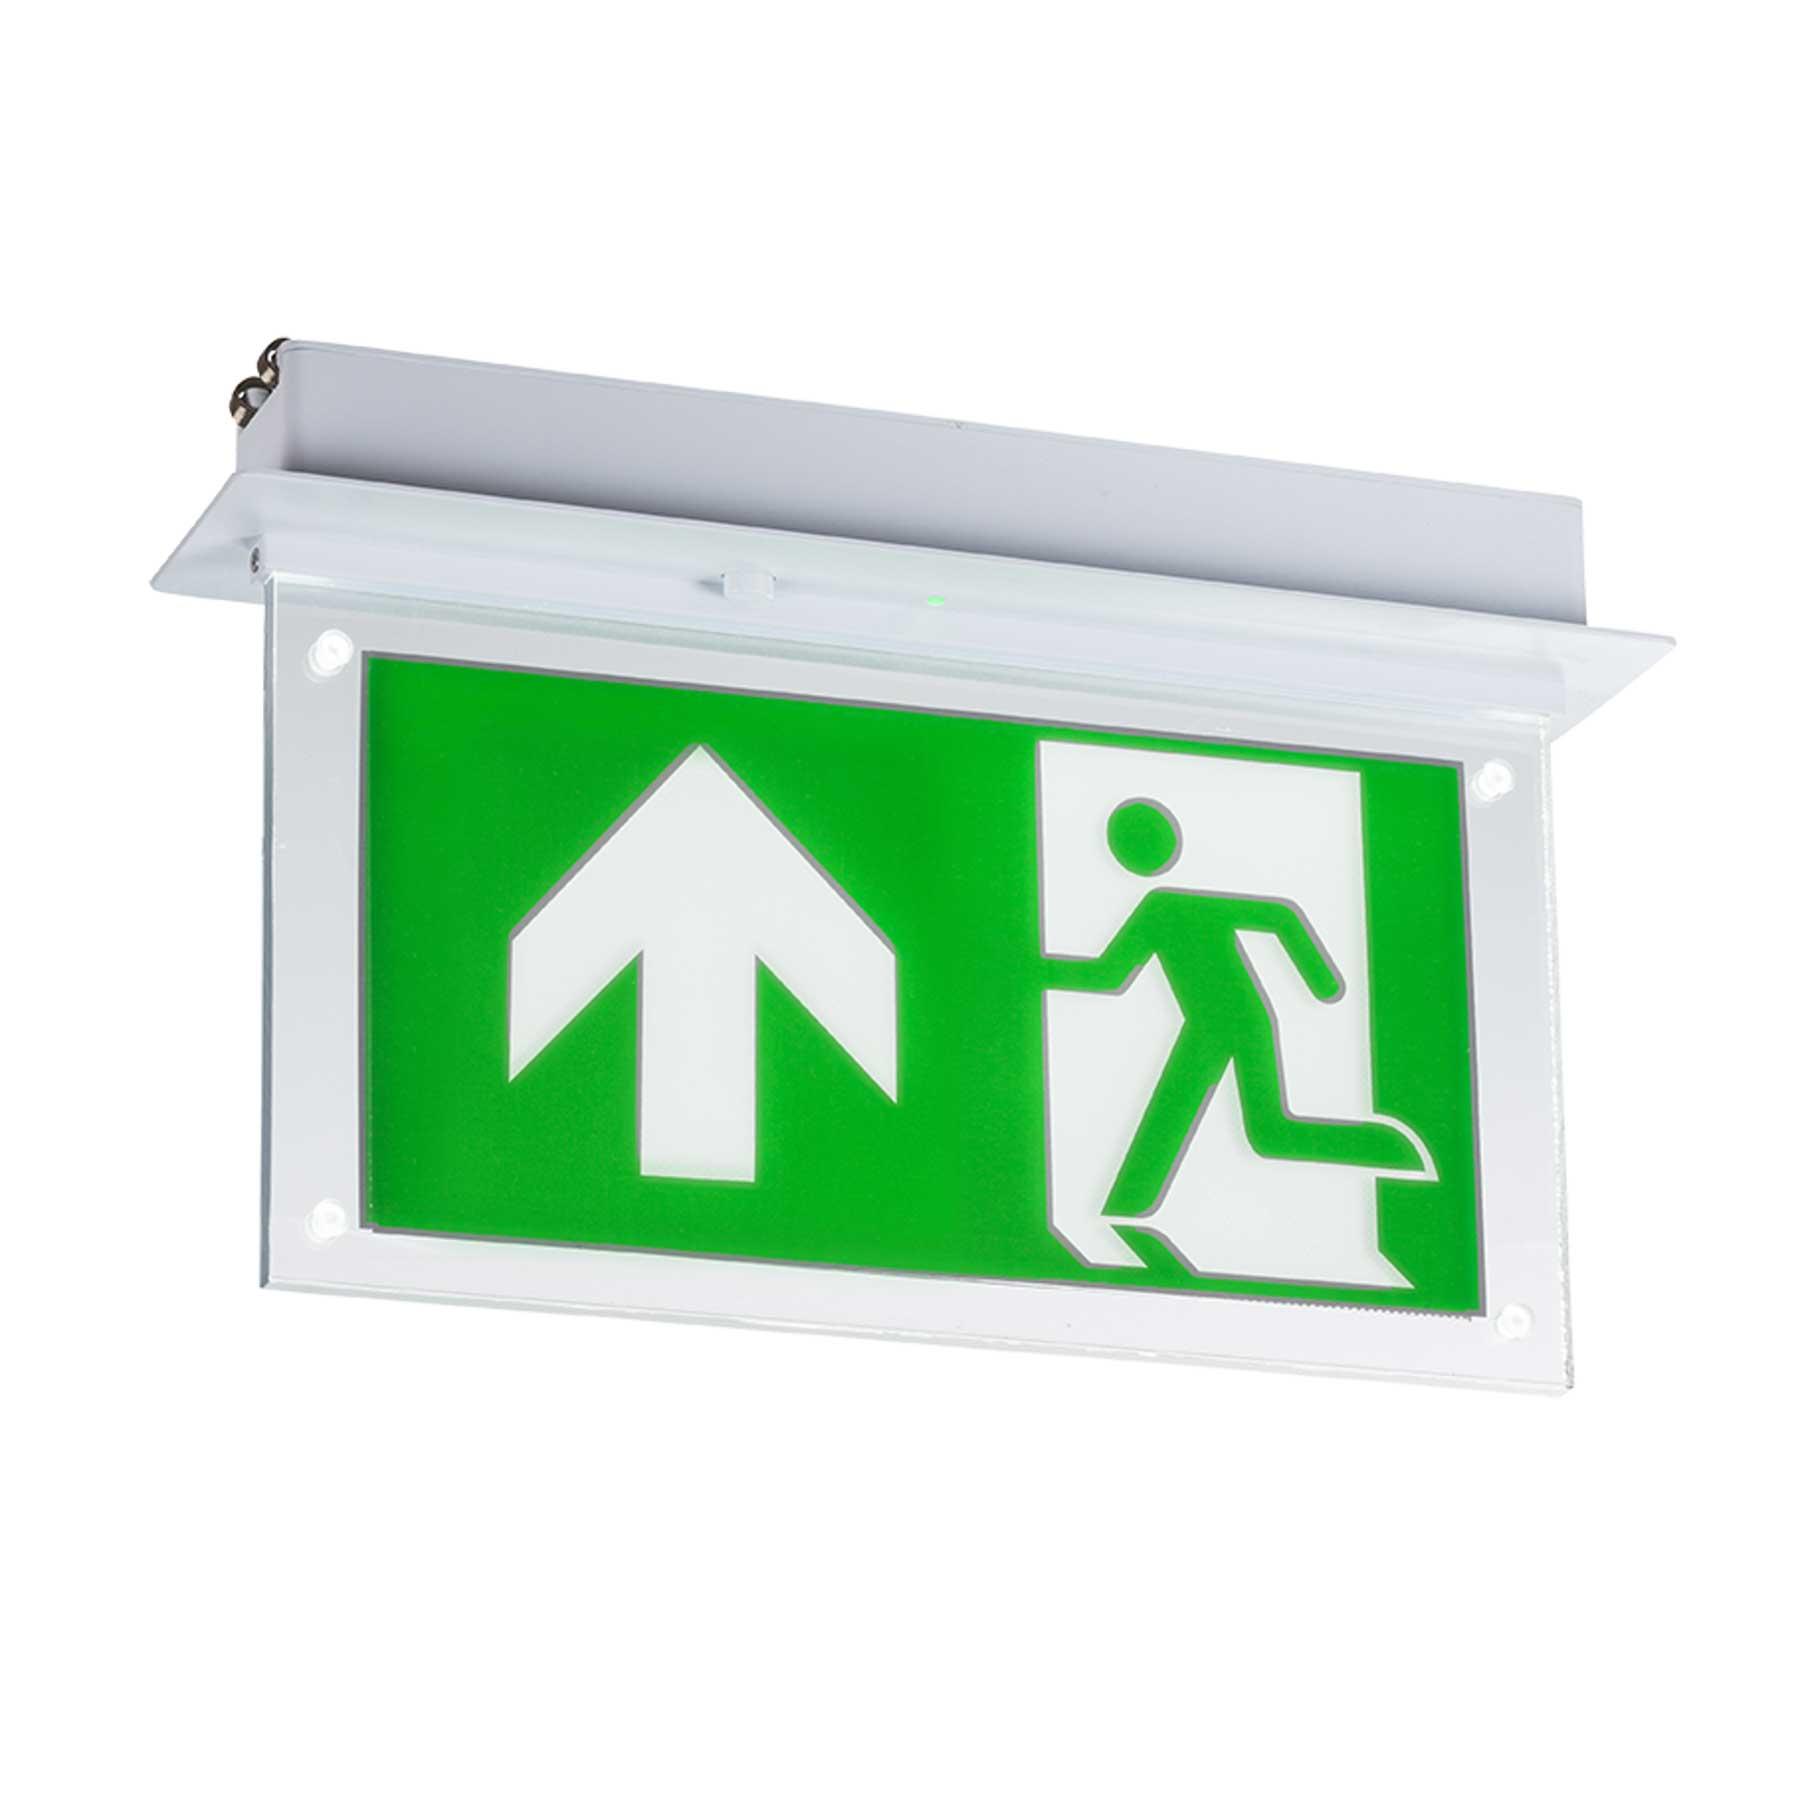 Knightsbridge Emlrec 230v 2w Recessed Led Emergency Exit